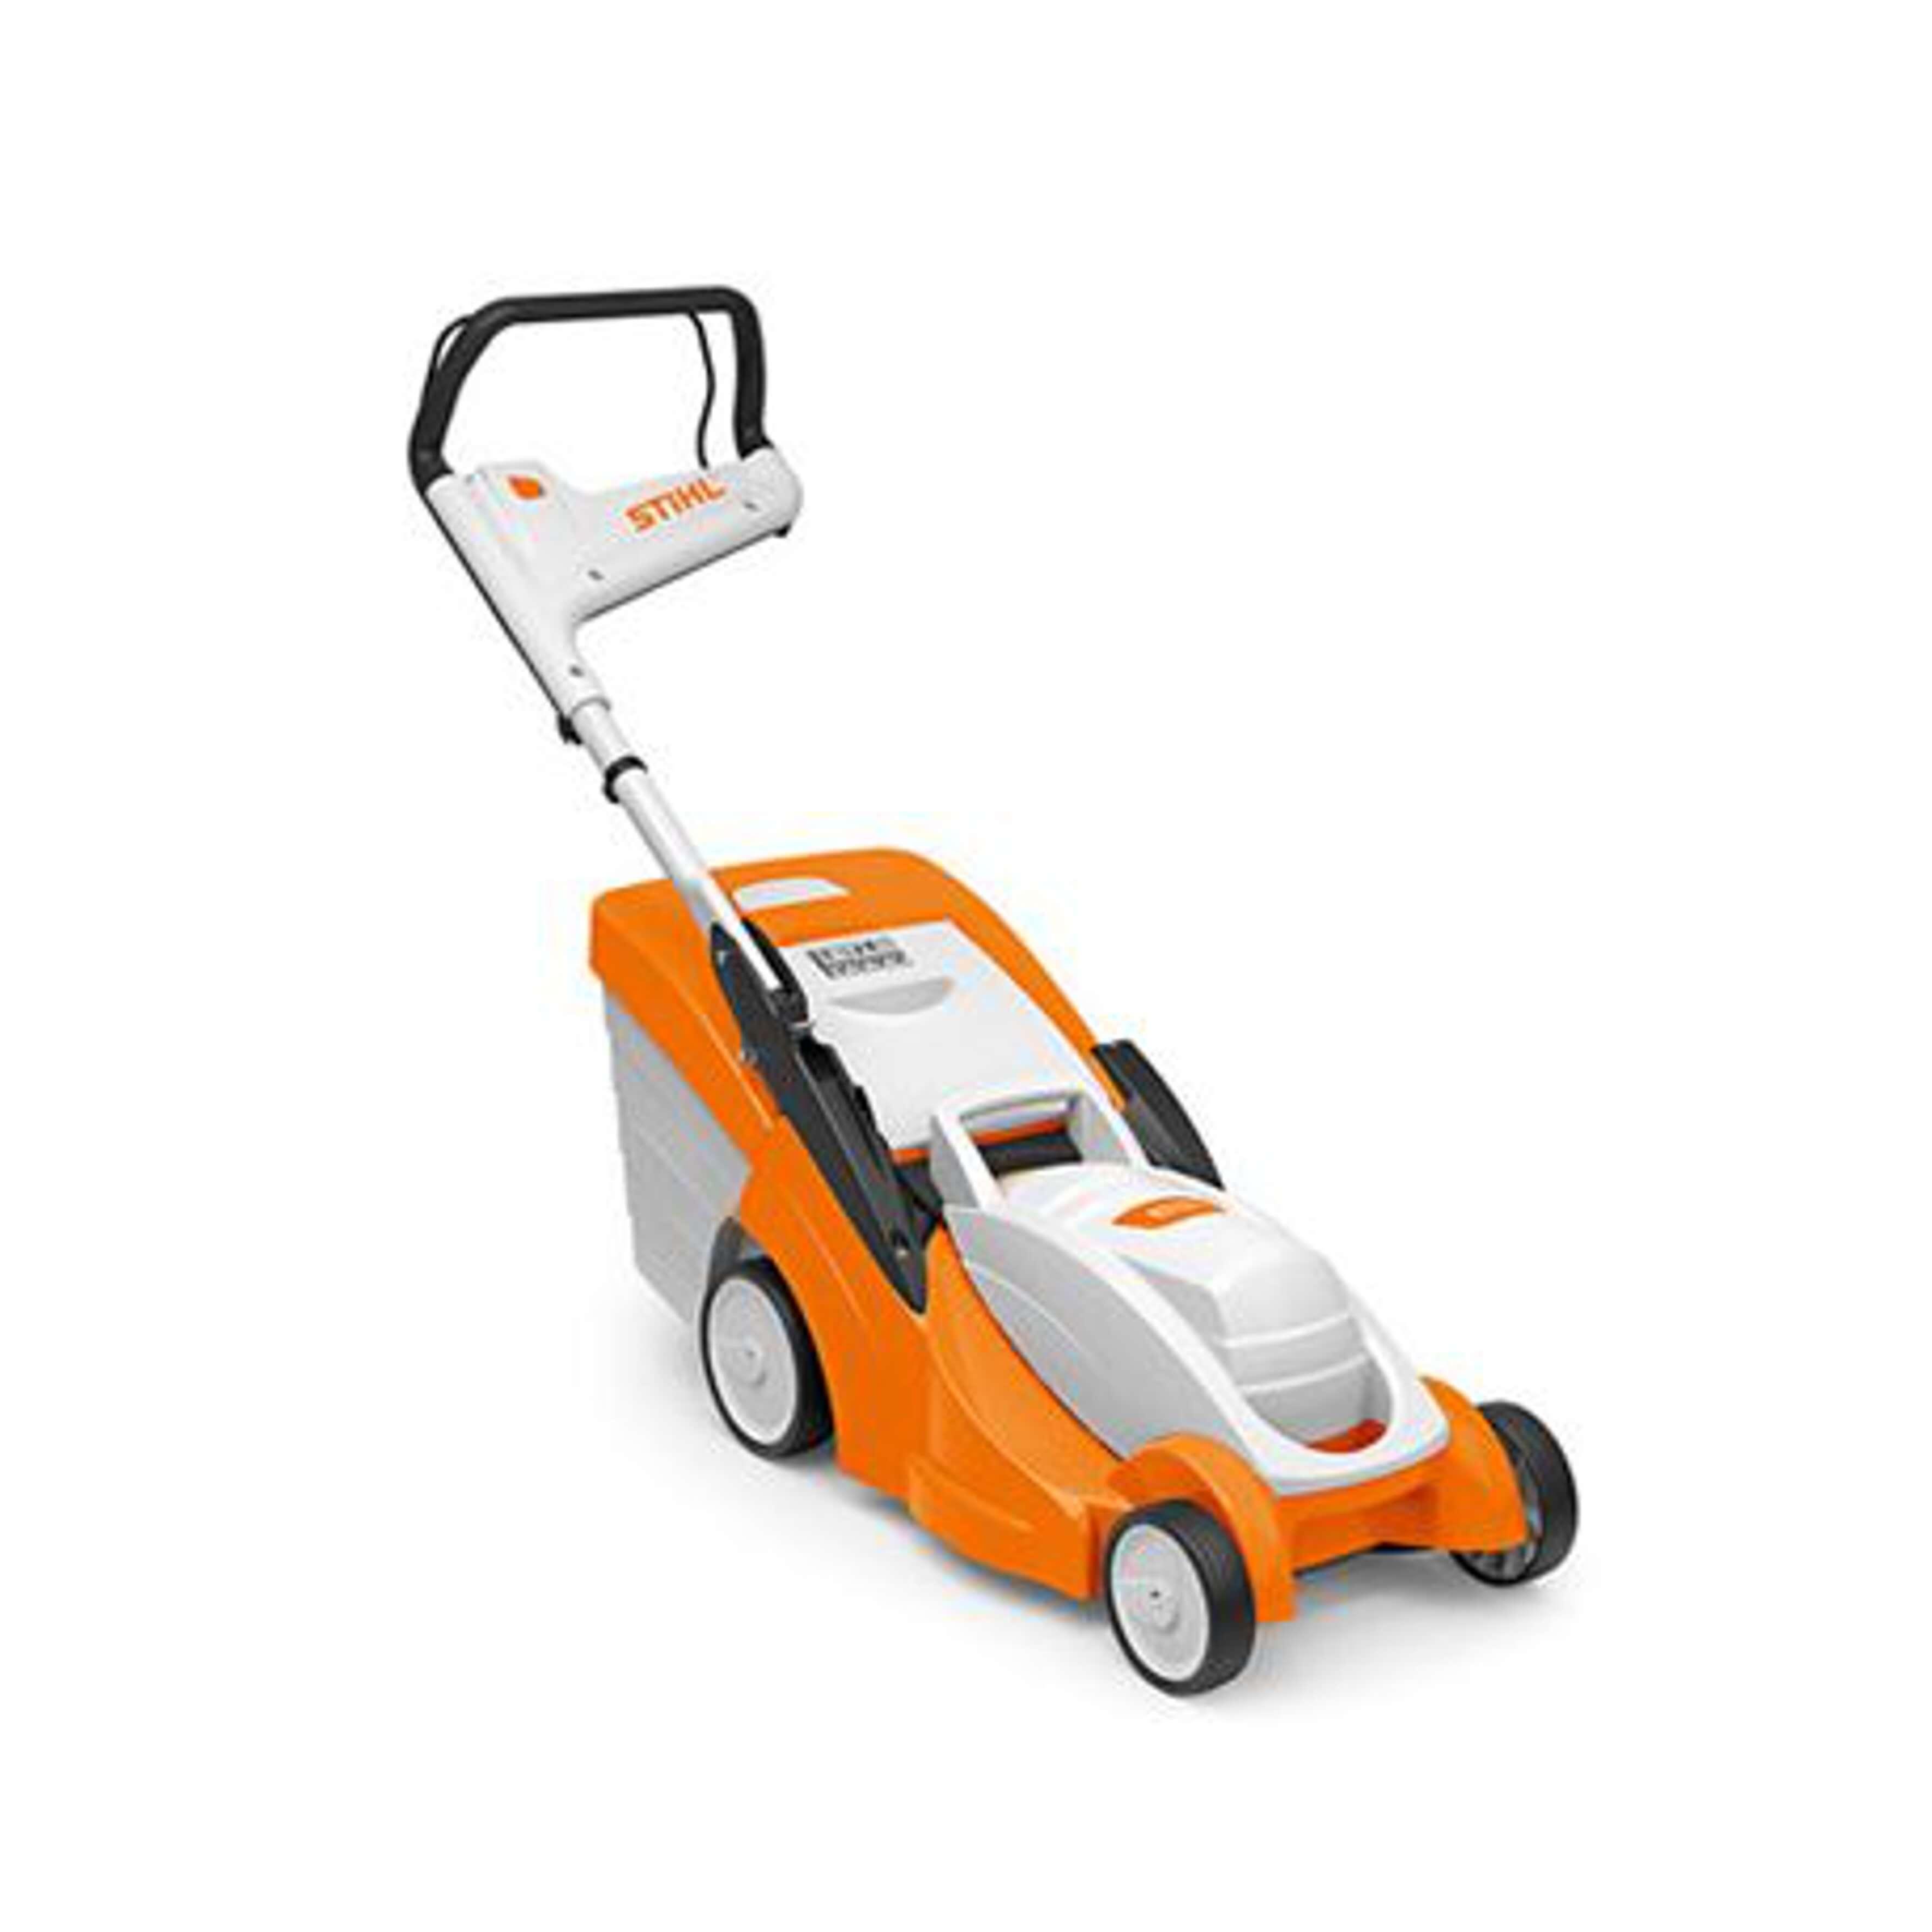 Stihl RMA 2.0 RT Lawn Mower Parts